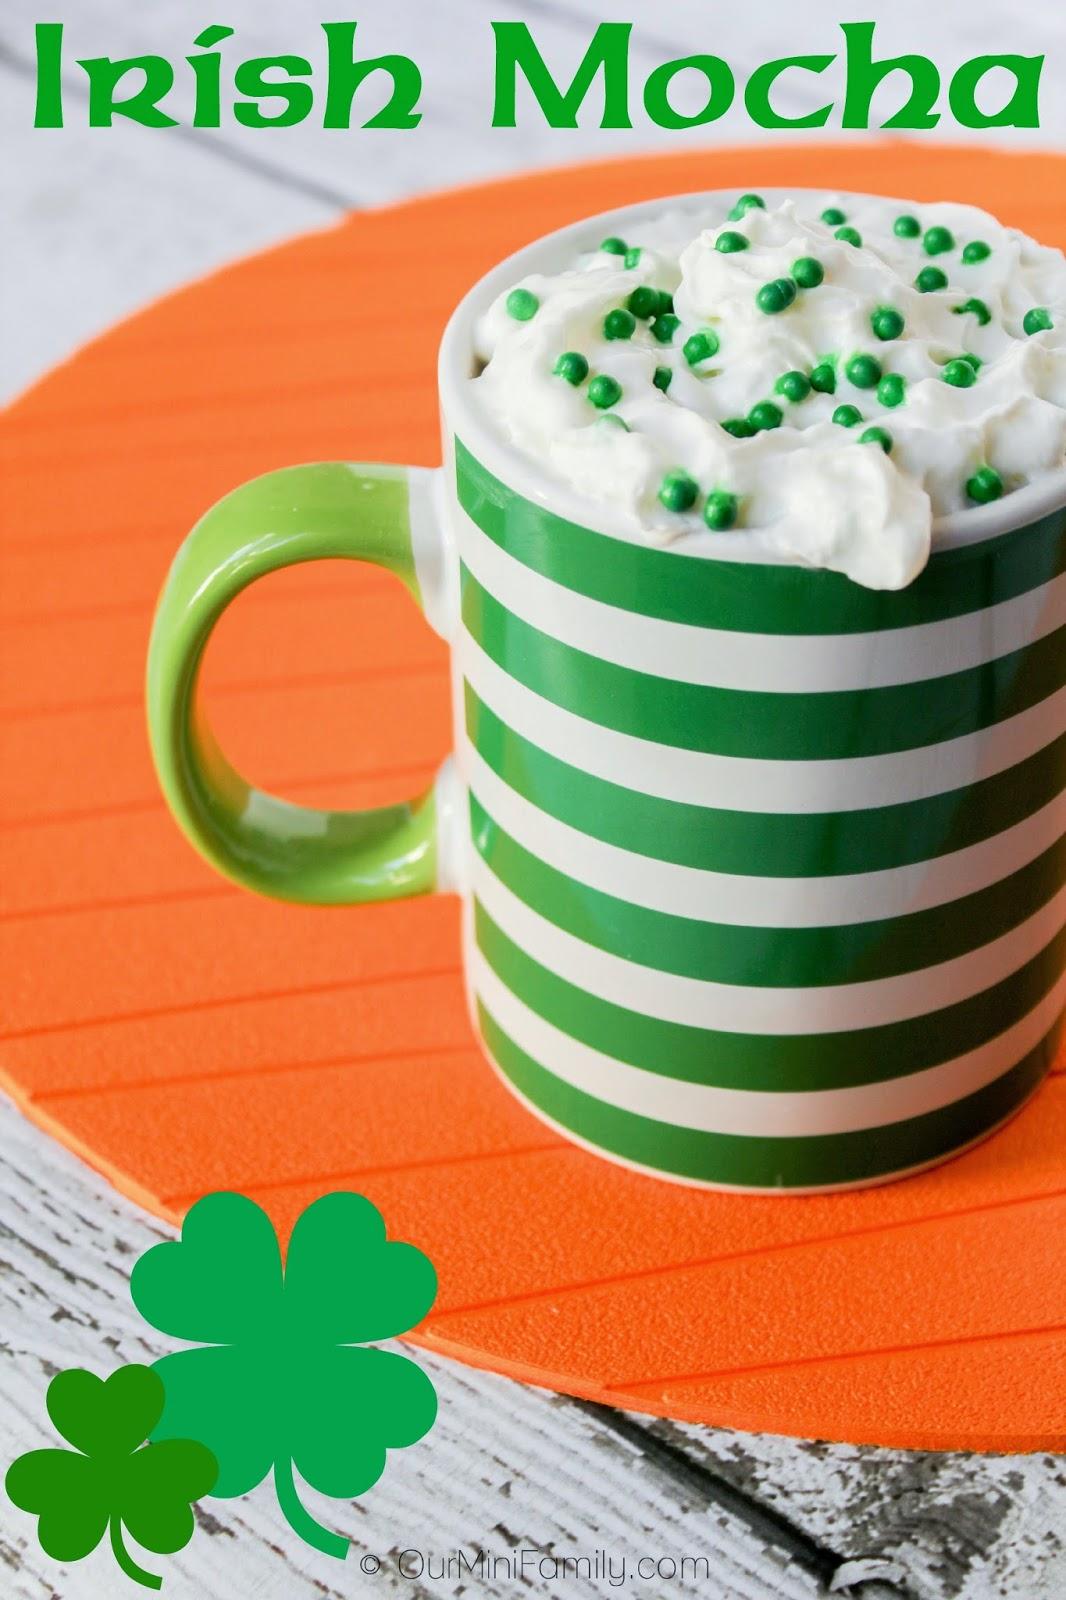 St. Patrick's Day Posts